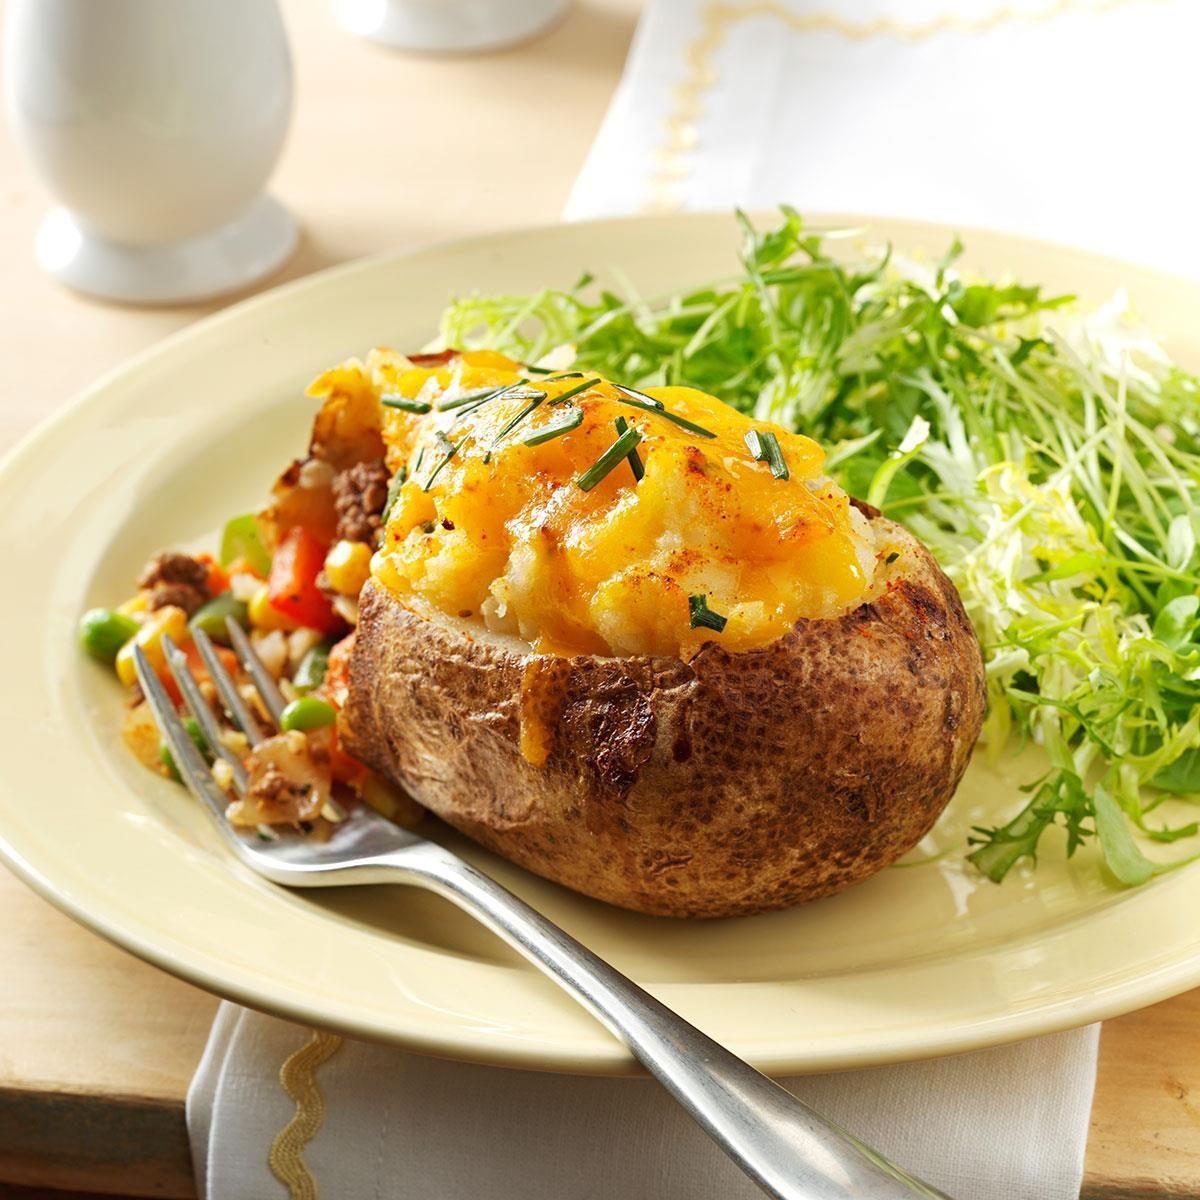 Super Stuffed Baked Potatoes: Shepherd's Pie Twice-Baked Potatoes Recipe